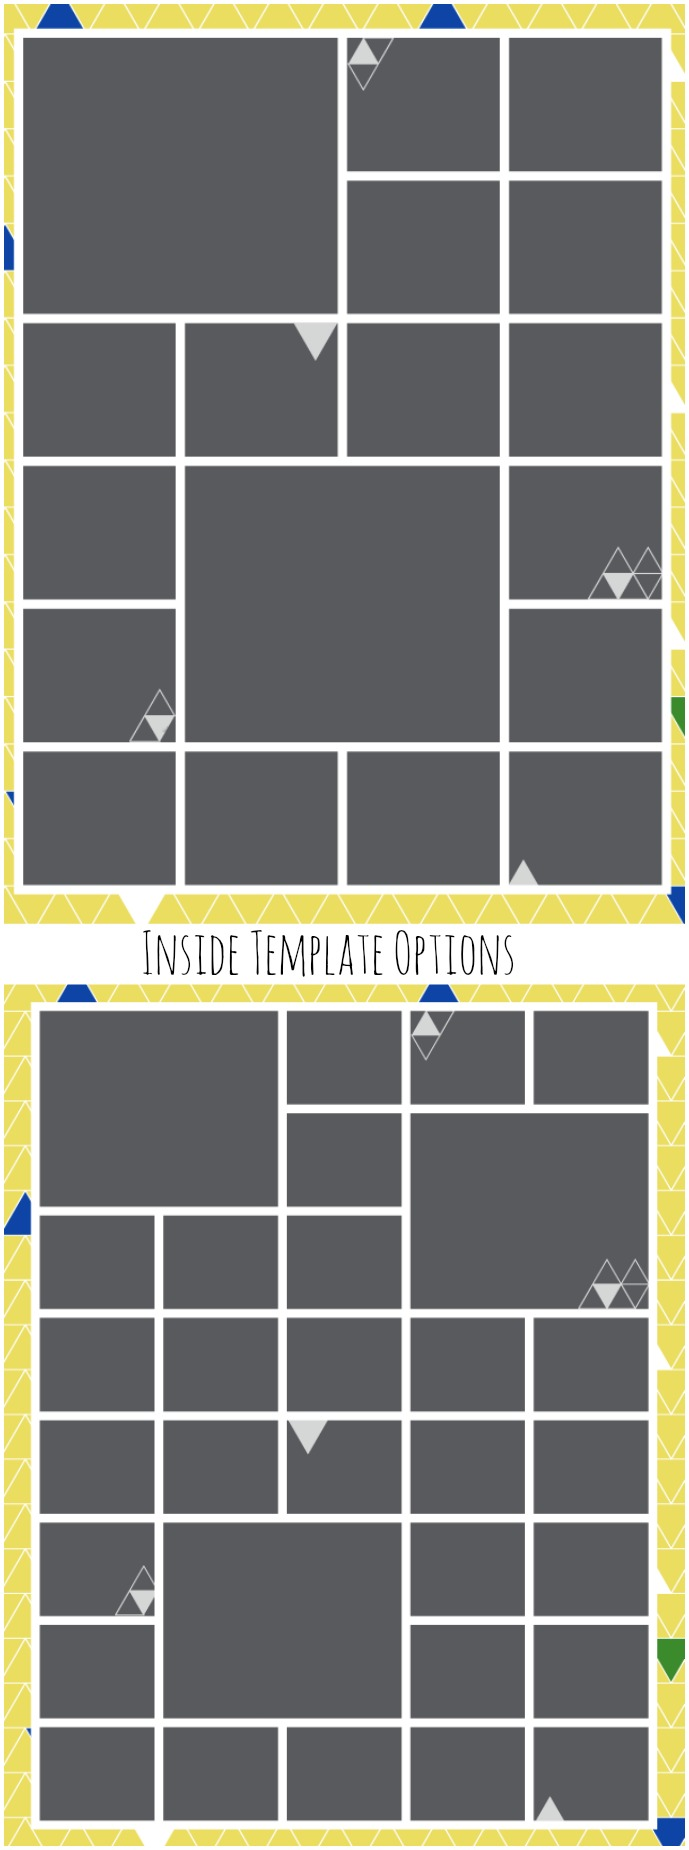 Free card templates